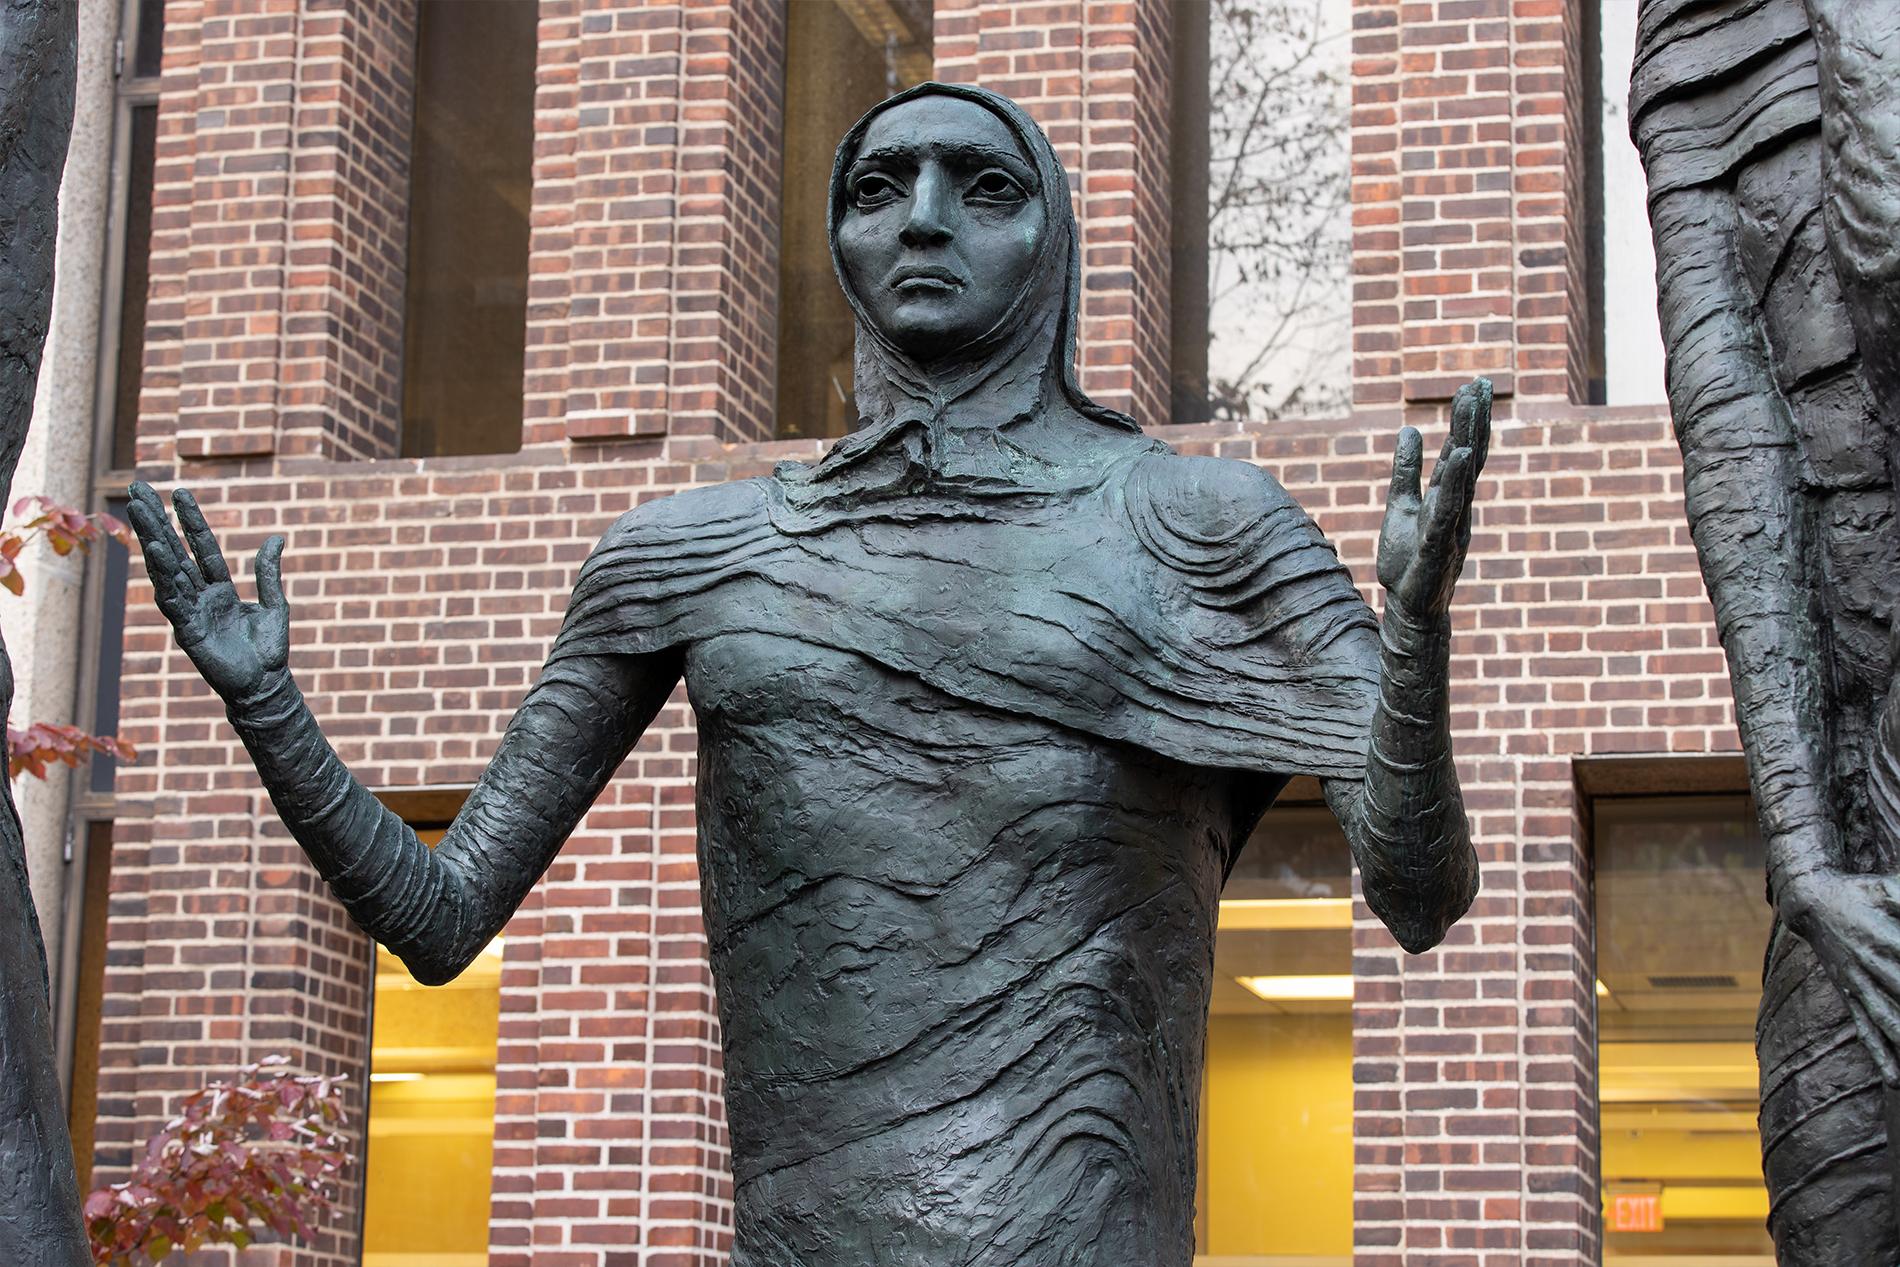 Detail of outdoor sculpture on University of Pennsylvania's campus – bronze figure